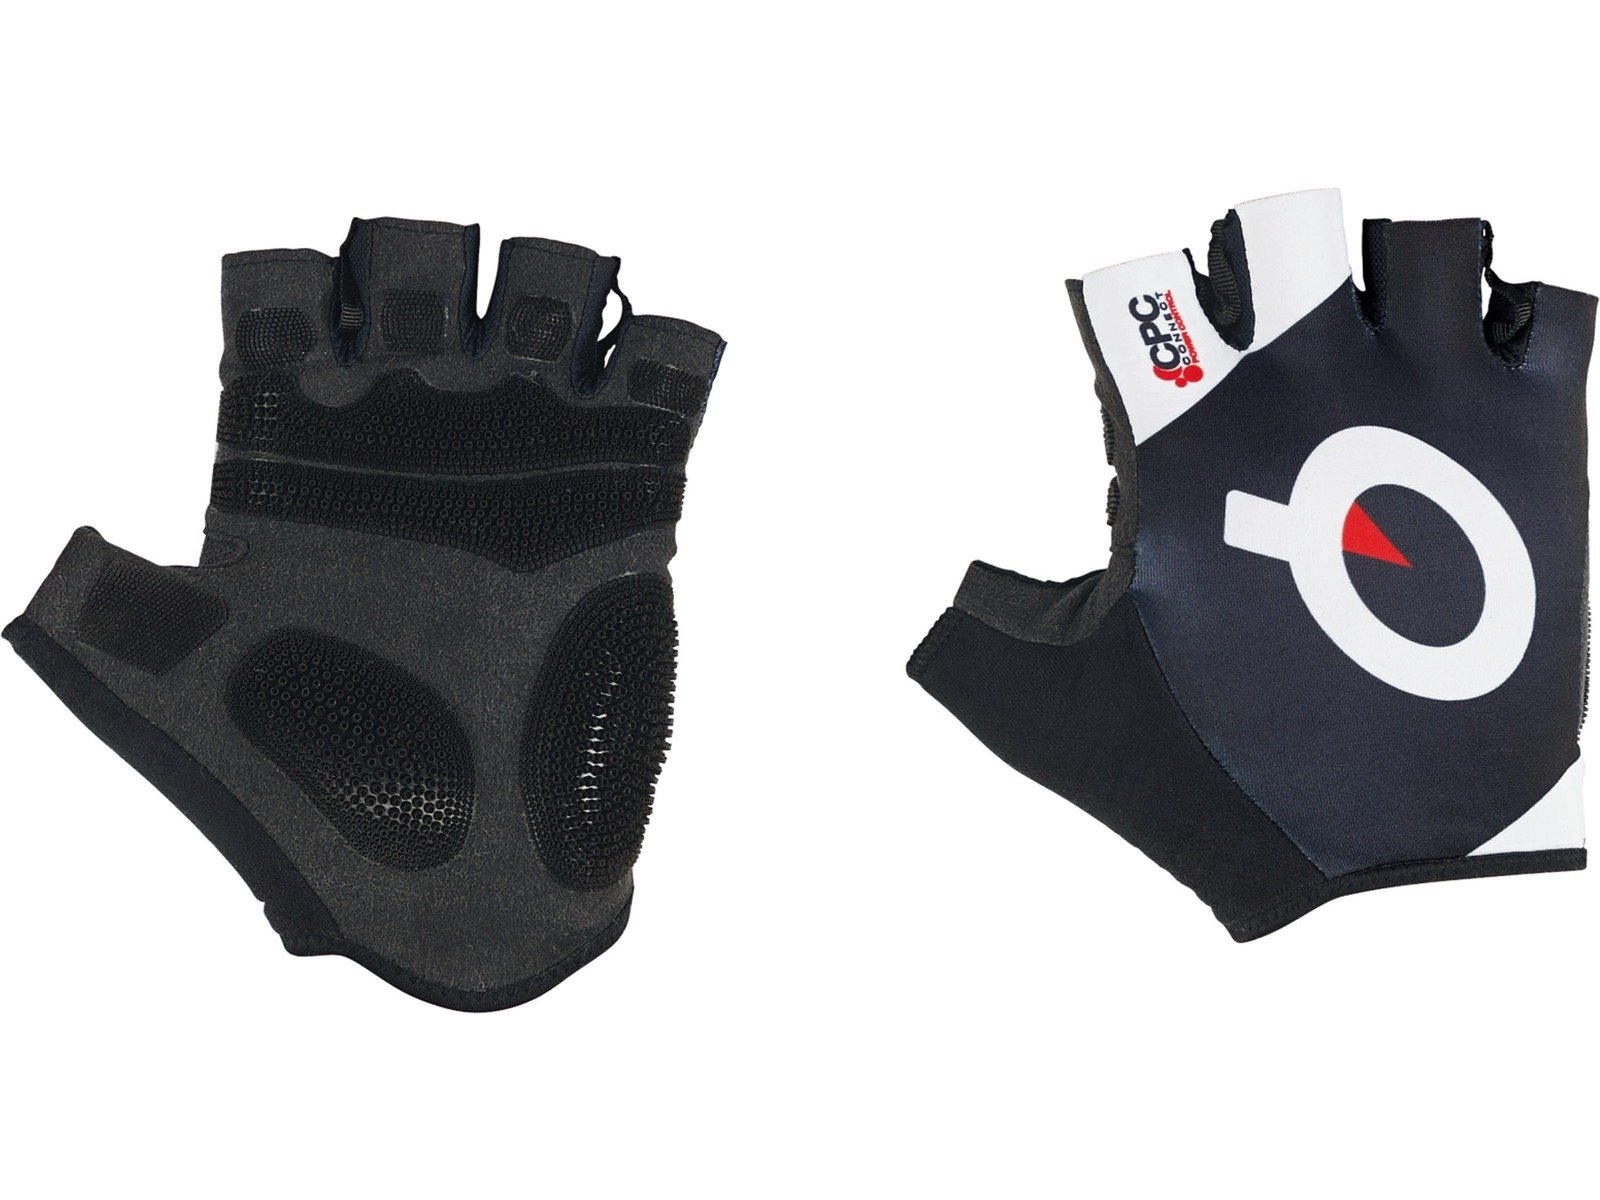 Prologo CPC Glove Short Finger: Black Euro XLG